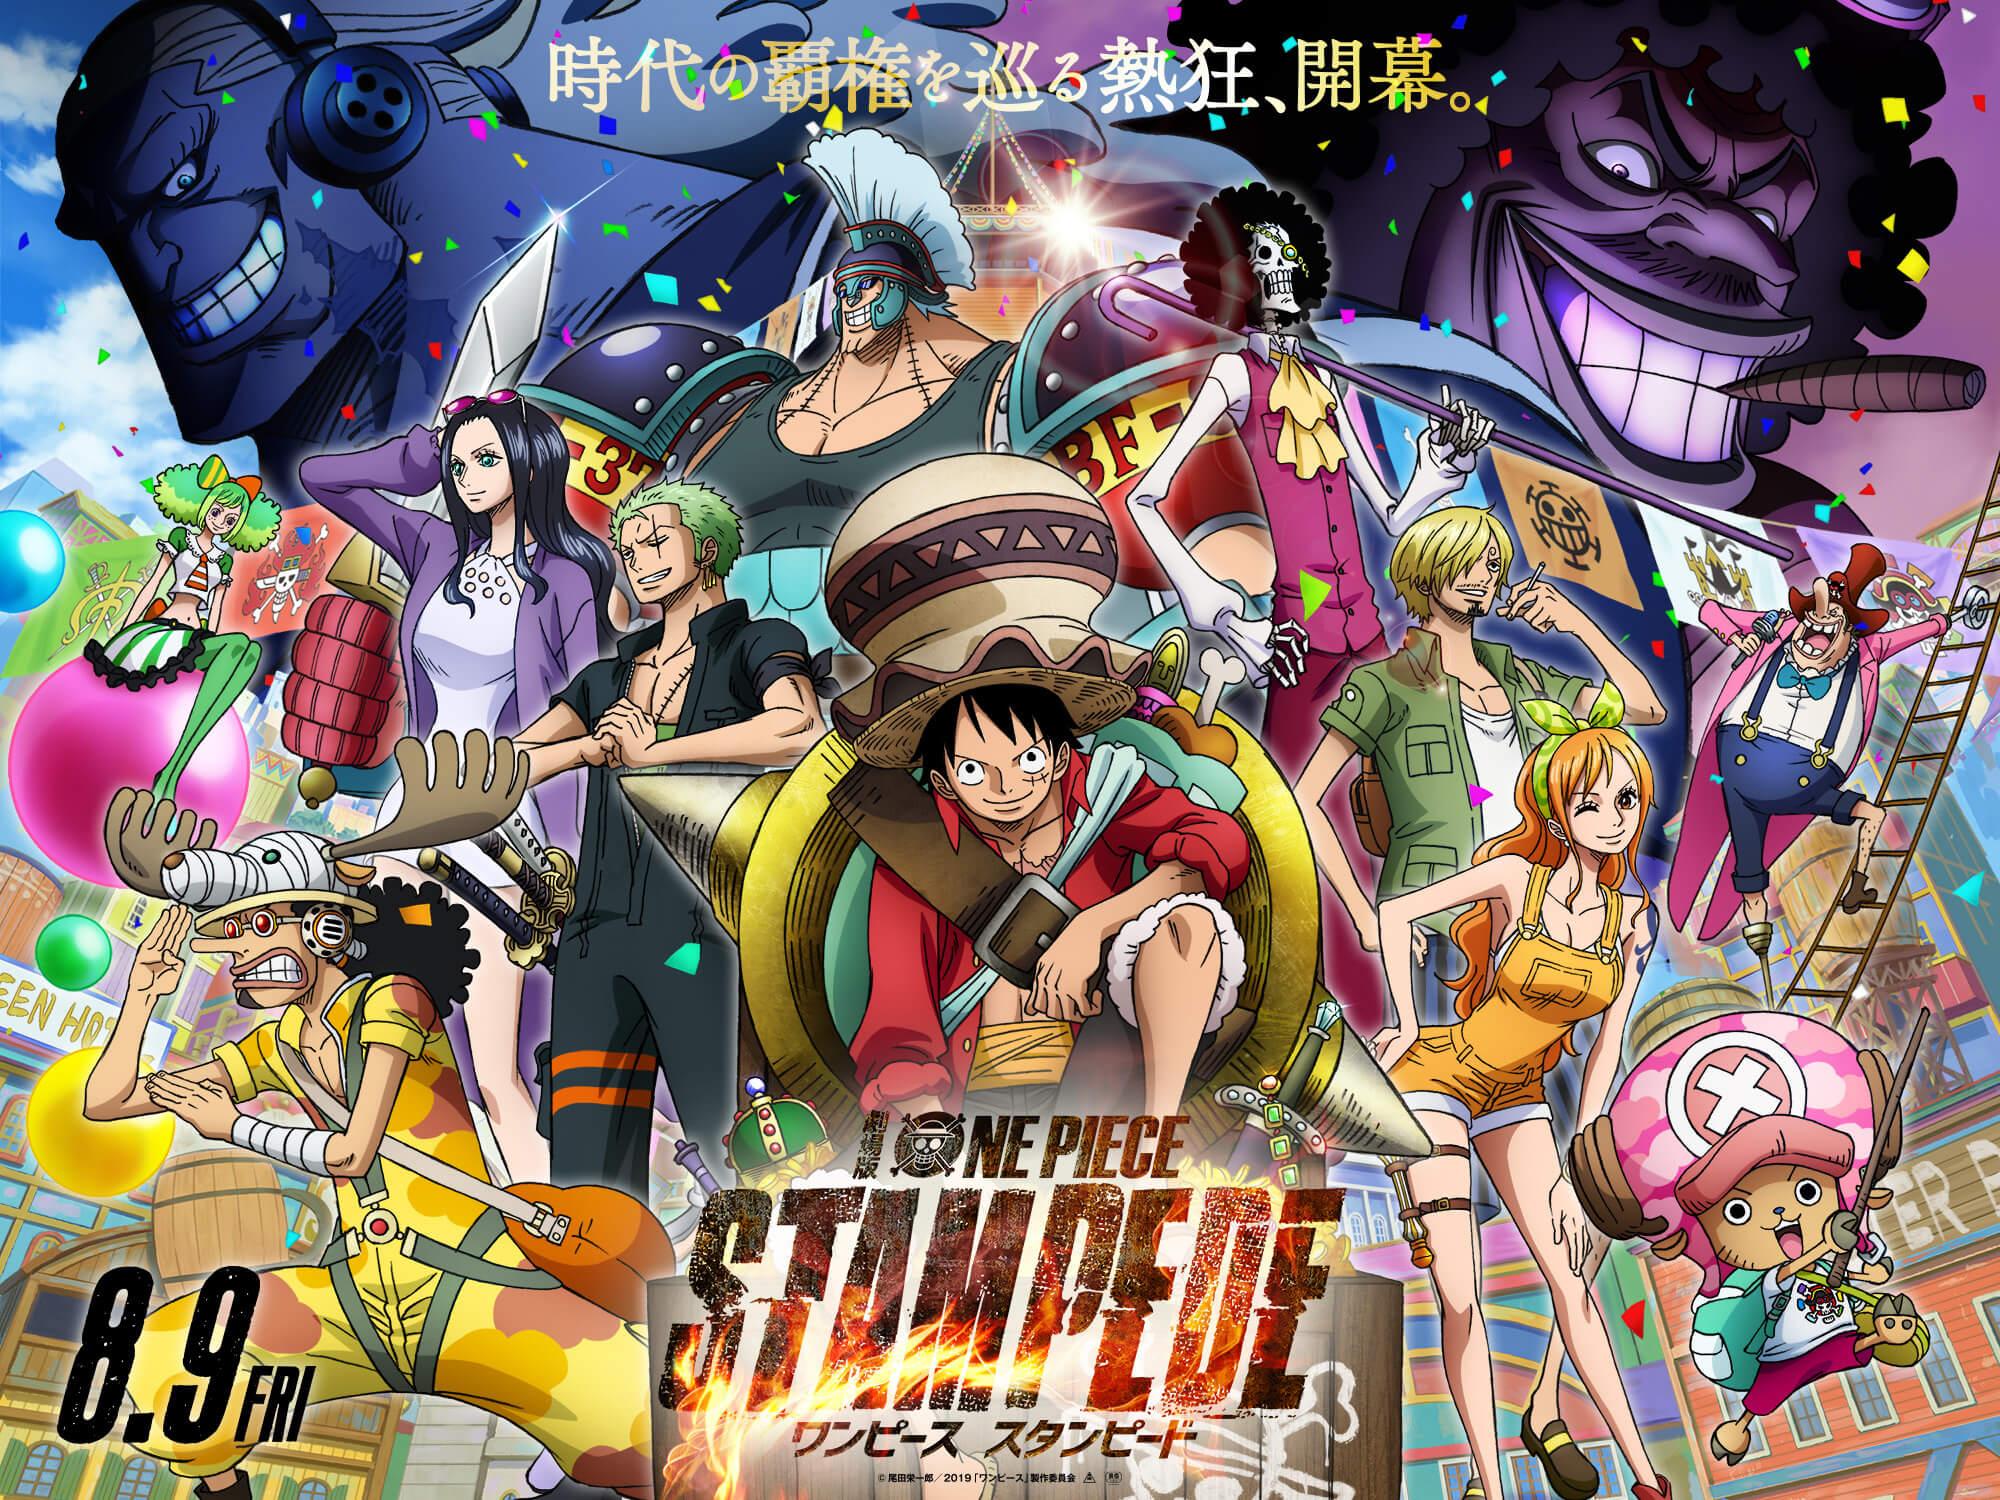 One Piece Stampede Le Film Sera Diffusé Au Cinéma En